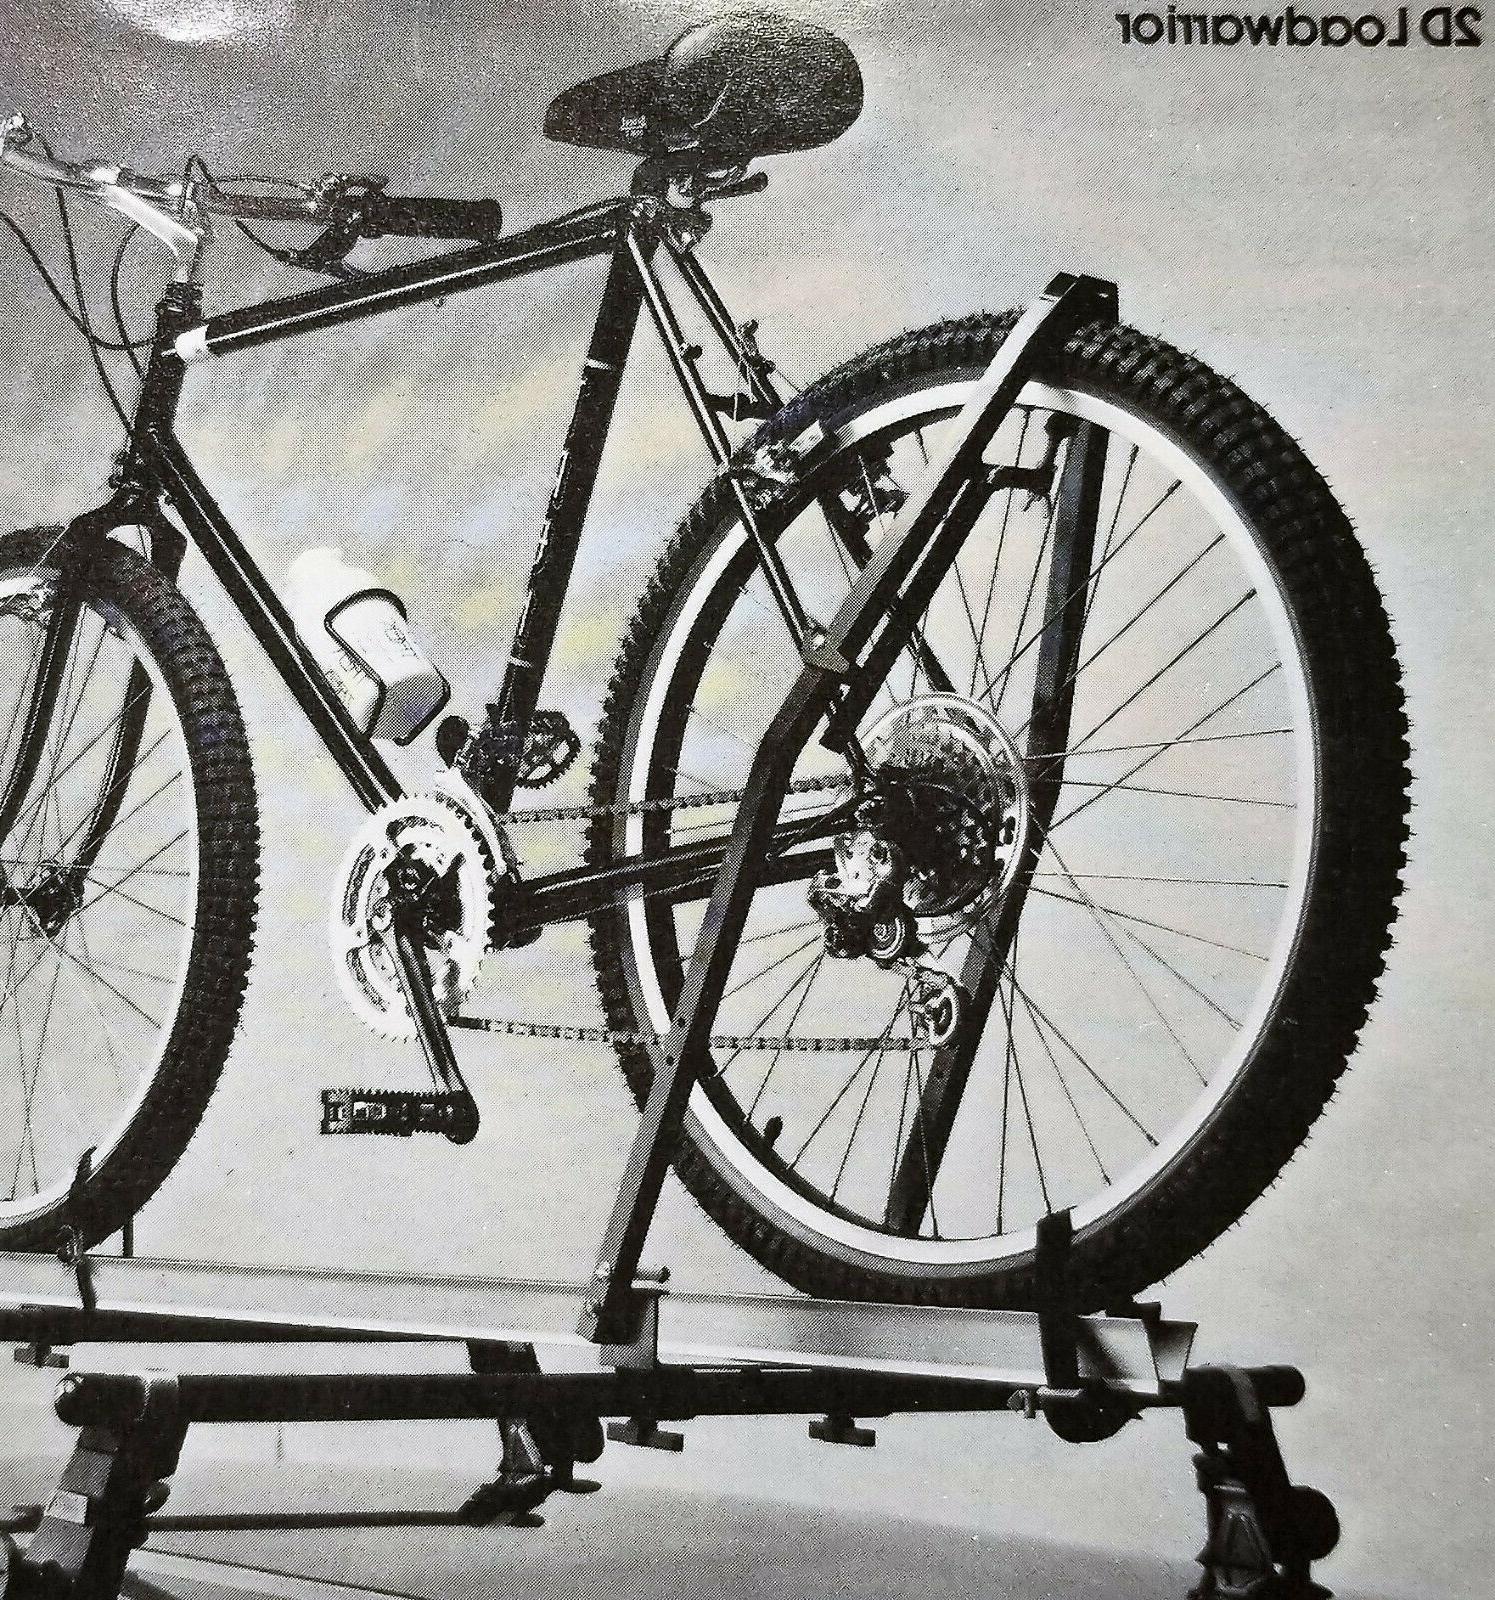 Yakima Mount Bike - C details! w/ Rnd bar